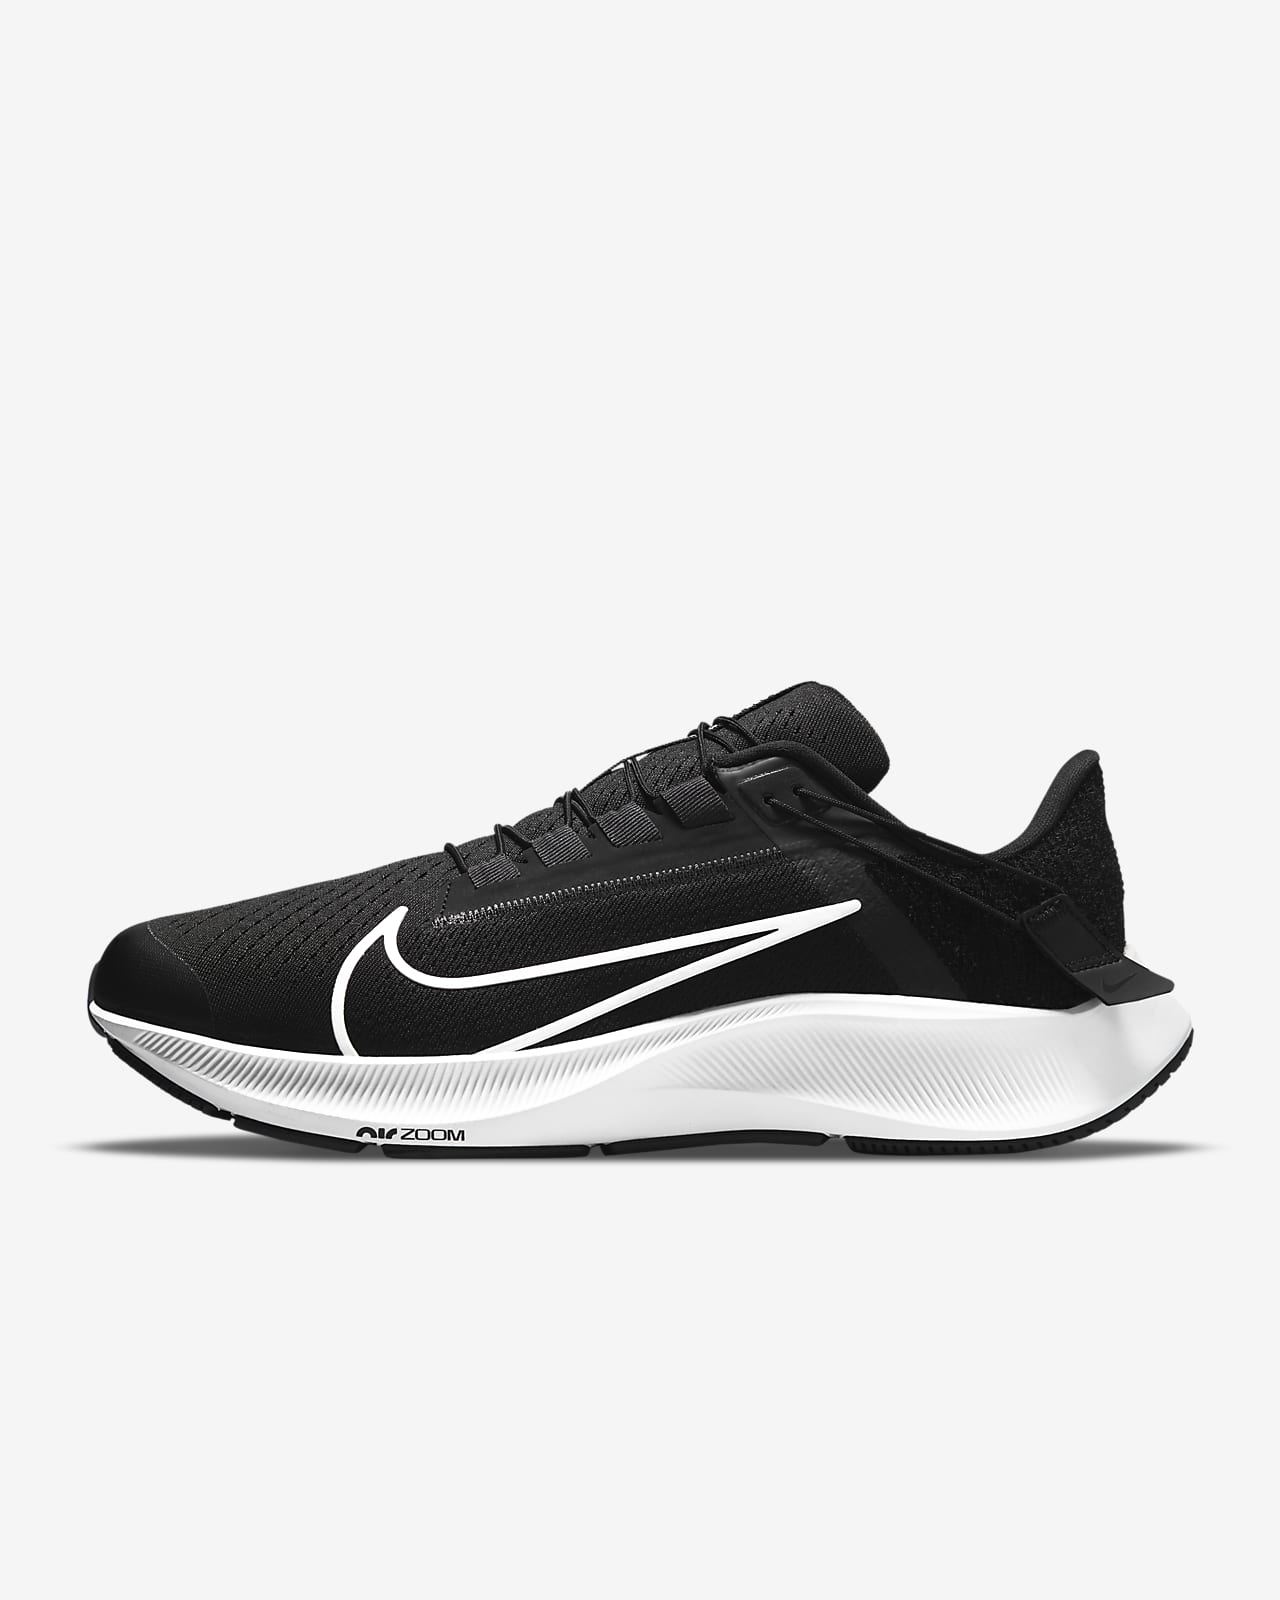 Sapatilhas de running Nike Air Zoom Pegasus 38 FlyEase para homem (extralargas)